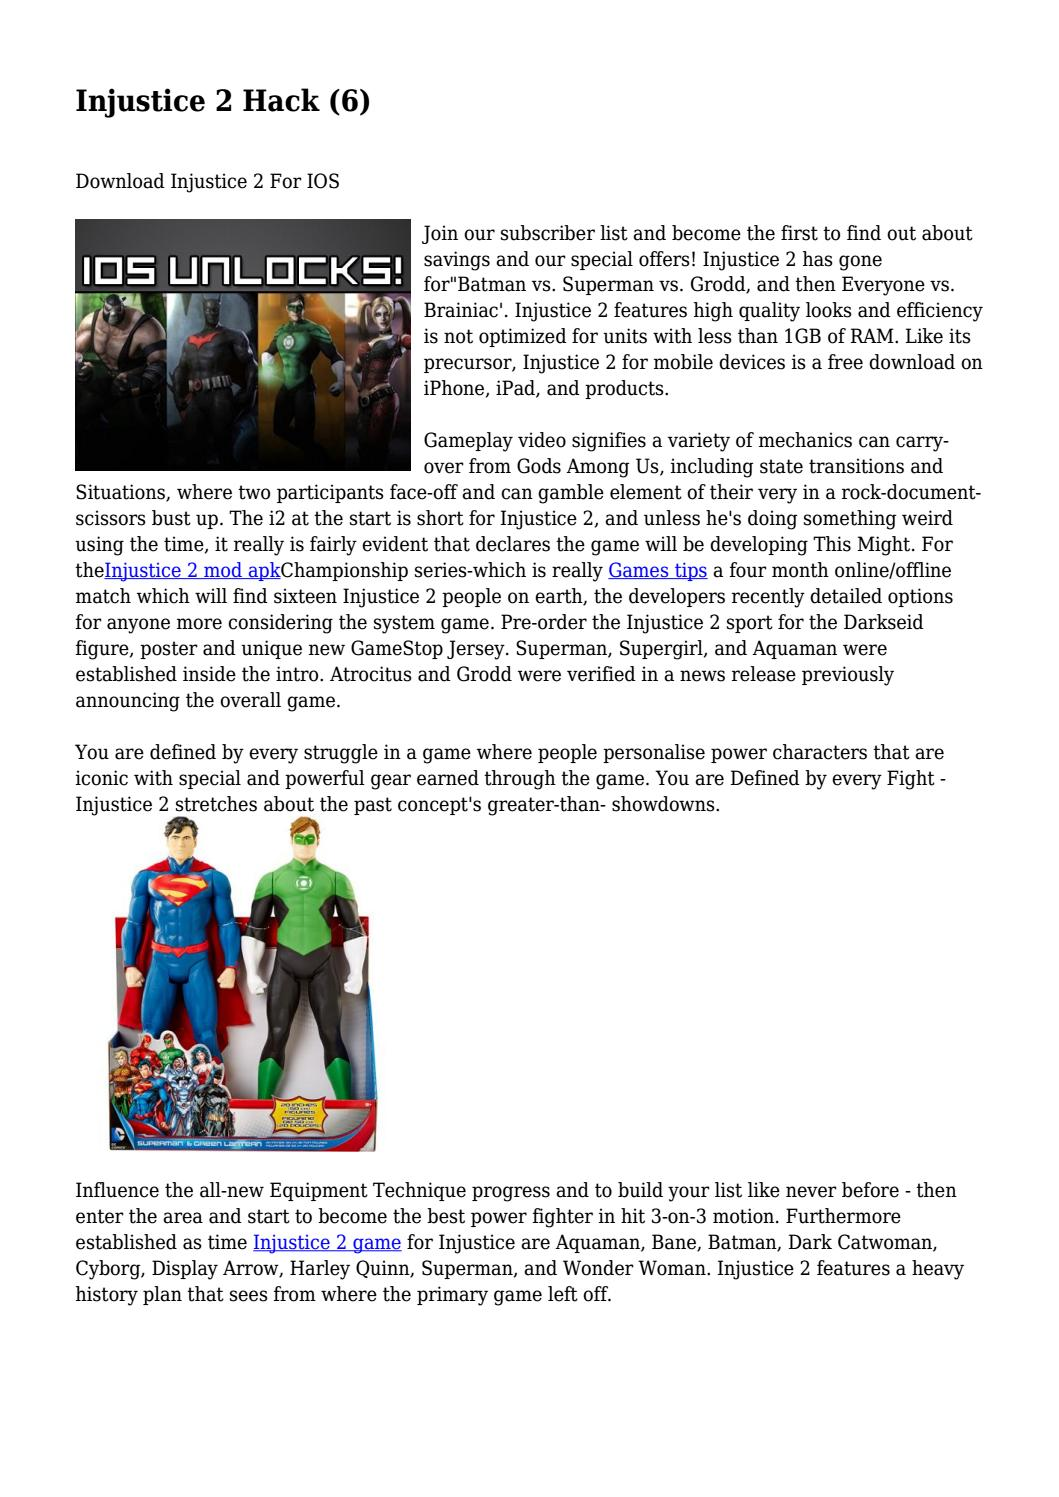 Injustice 2 Hack (6)    by burtvvzgkjwnrr - issuu